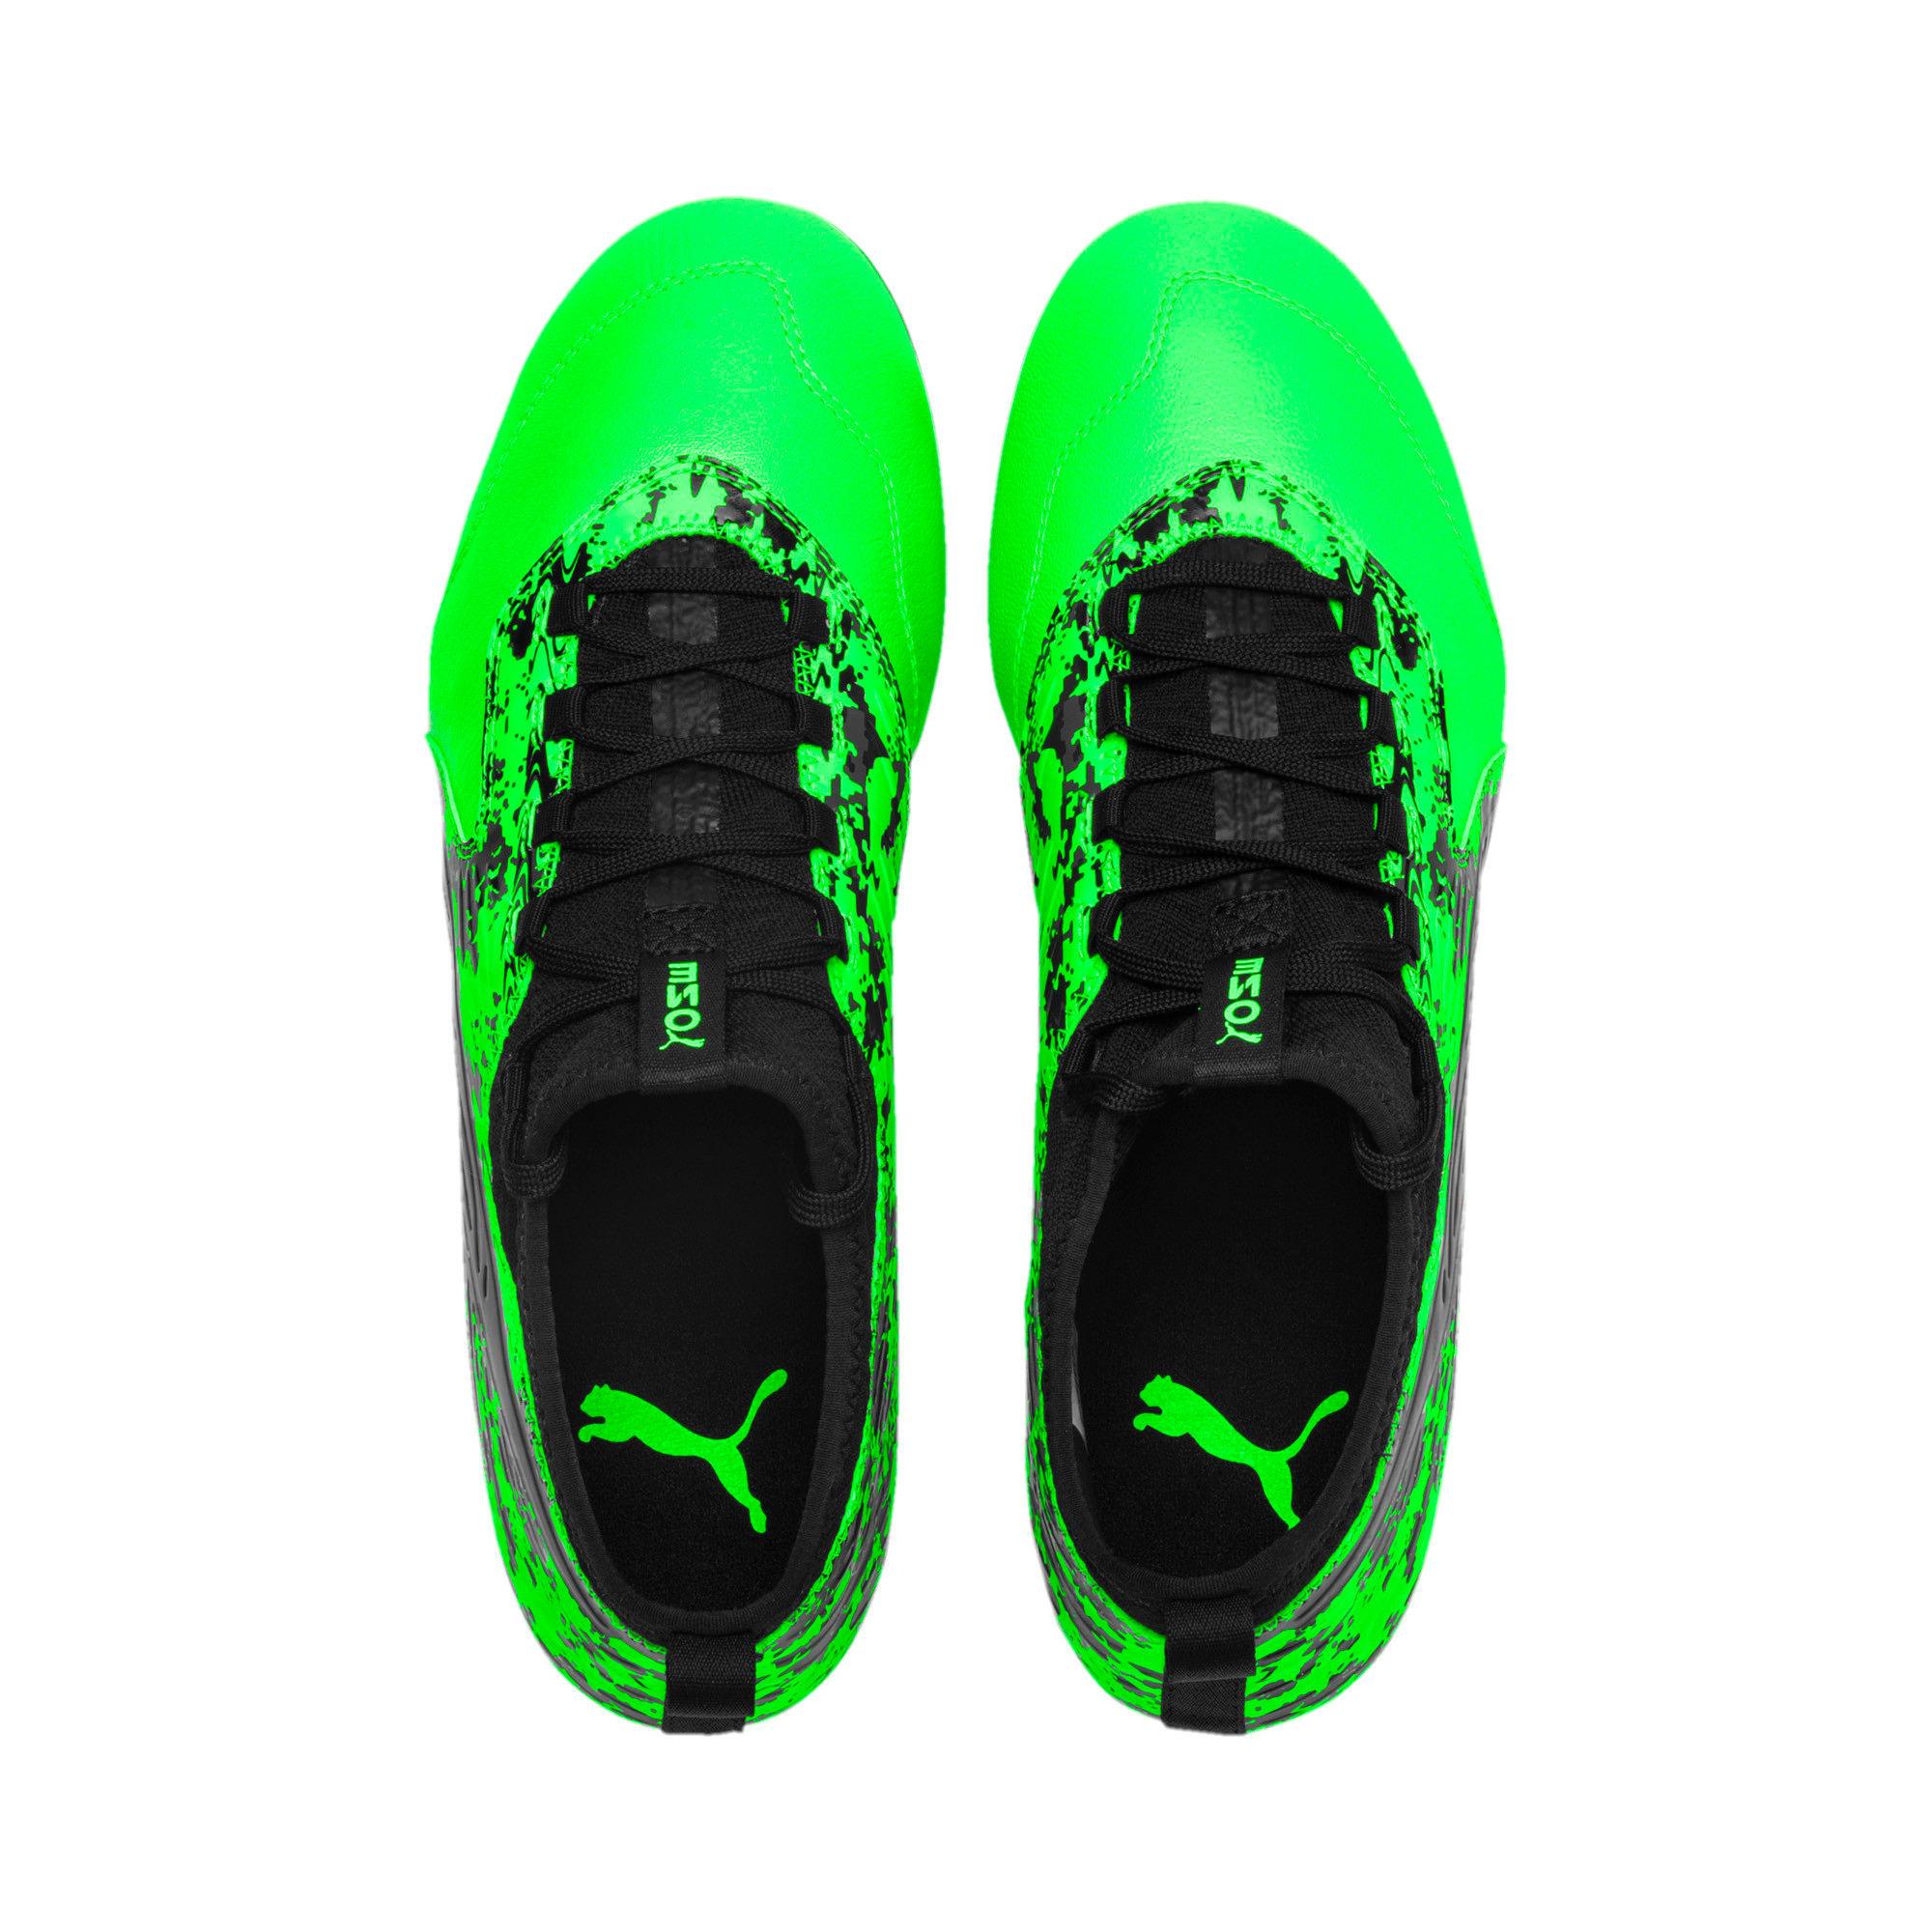 Thumbnail 6 of PUMA ONE 19.3 FG/AG Men's Soccer Cleats, Green Gecko-Black-Gray, medium